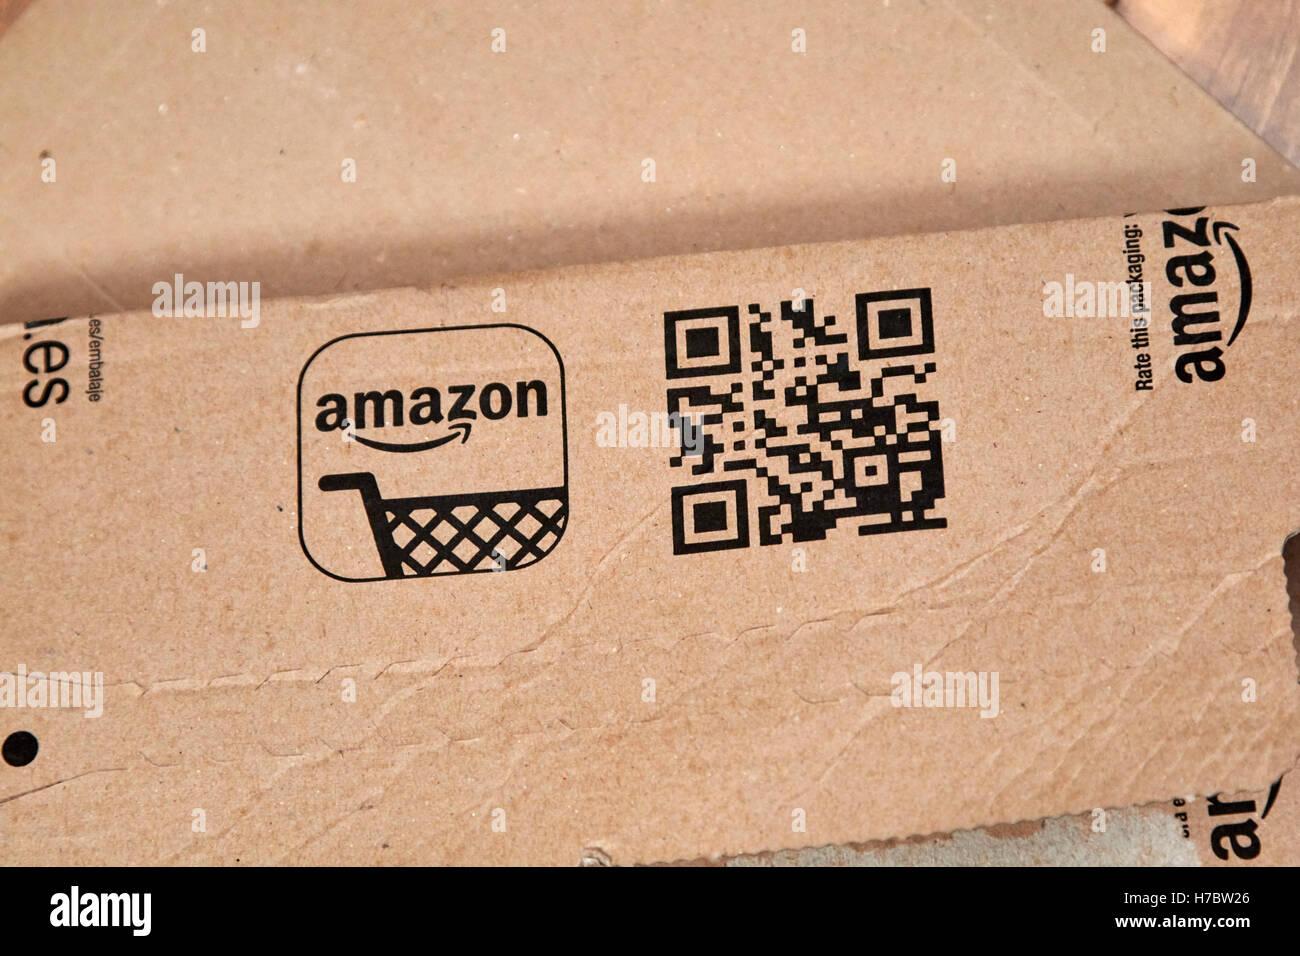 amazon cardboard mailer with QR code - Stock Image